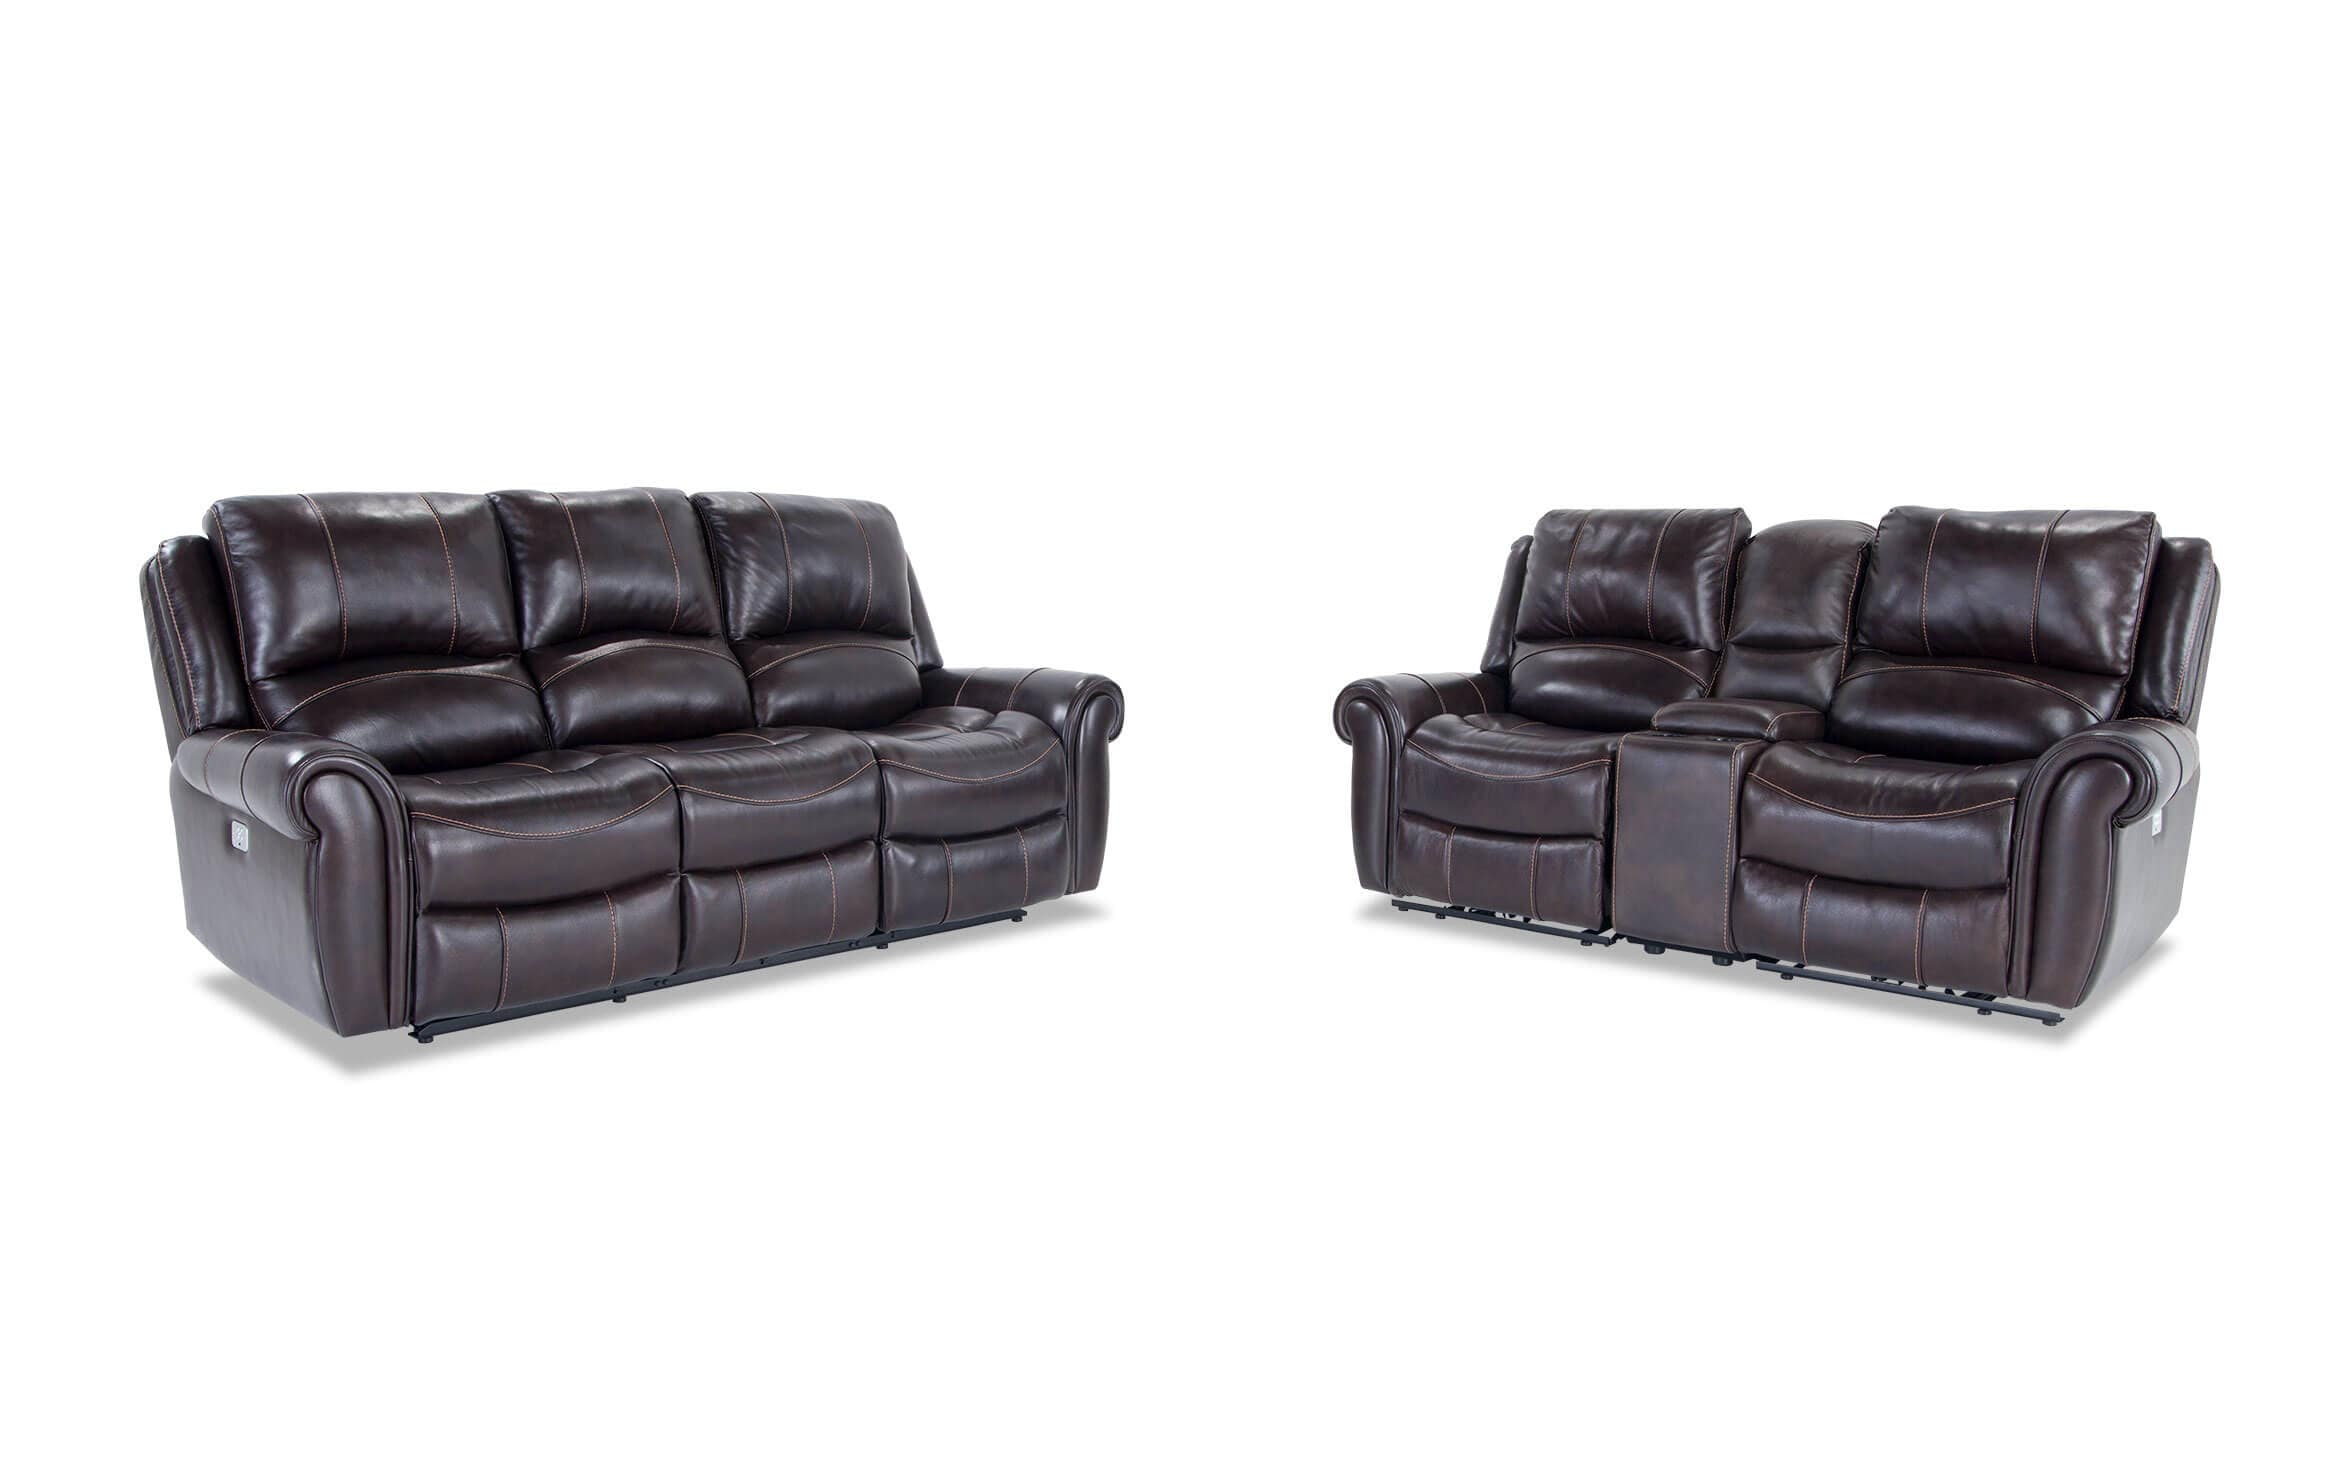 Bennett Leather Reclining Sofa